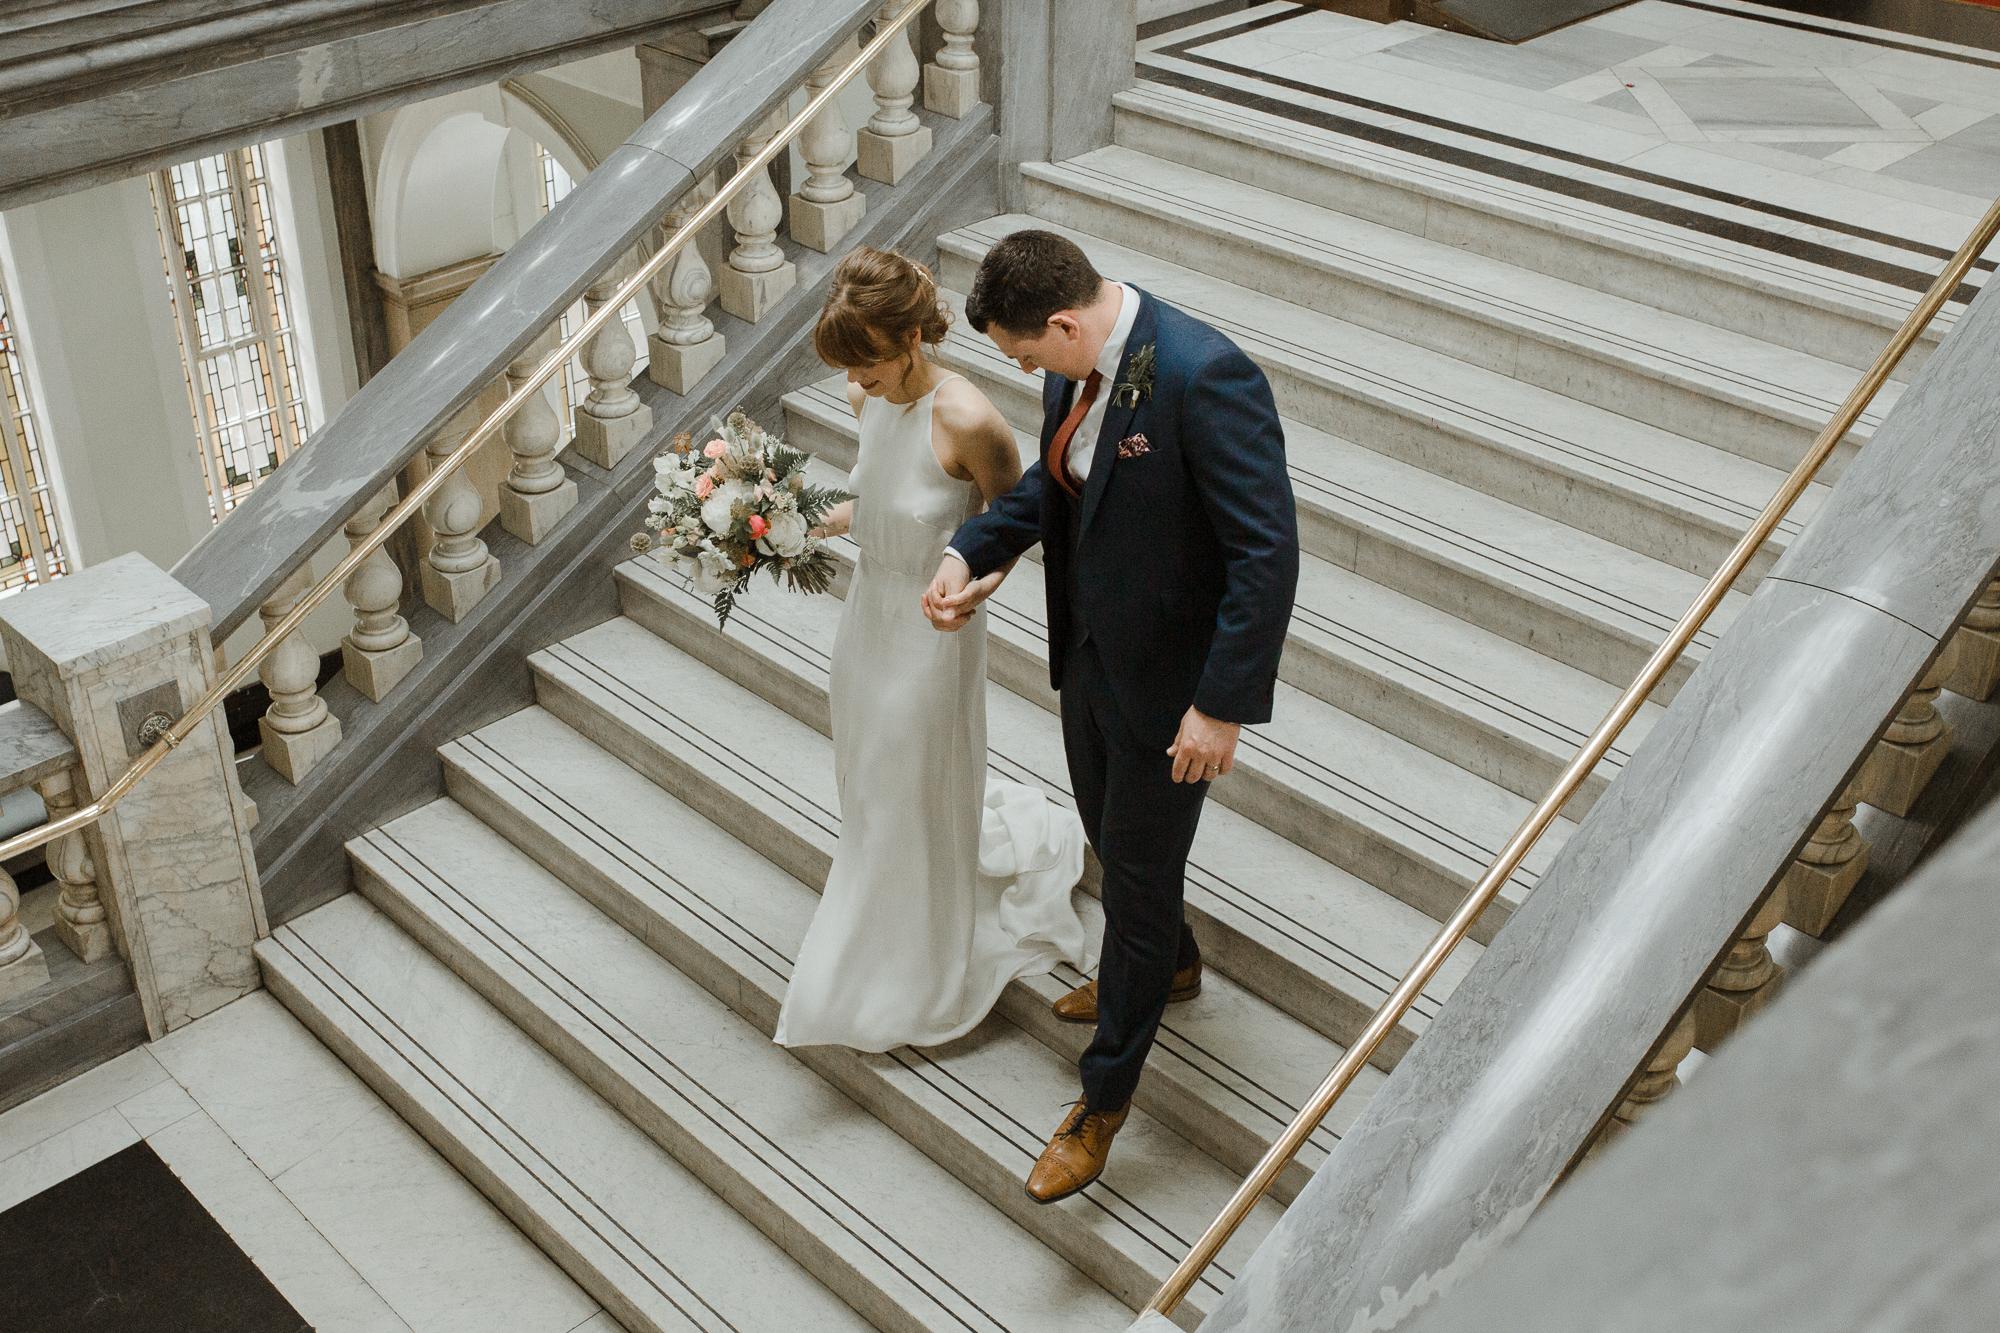 stephanie-green-wedding-photography-sulaflowers-sula-flowers-london-islington-town-hall-depot-n7-85.jpg